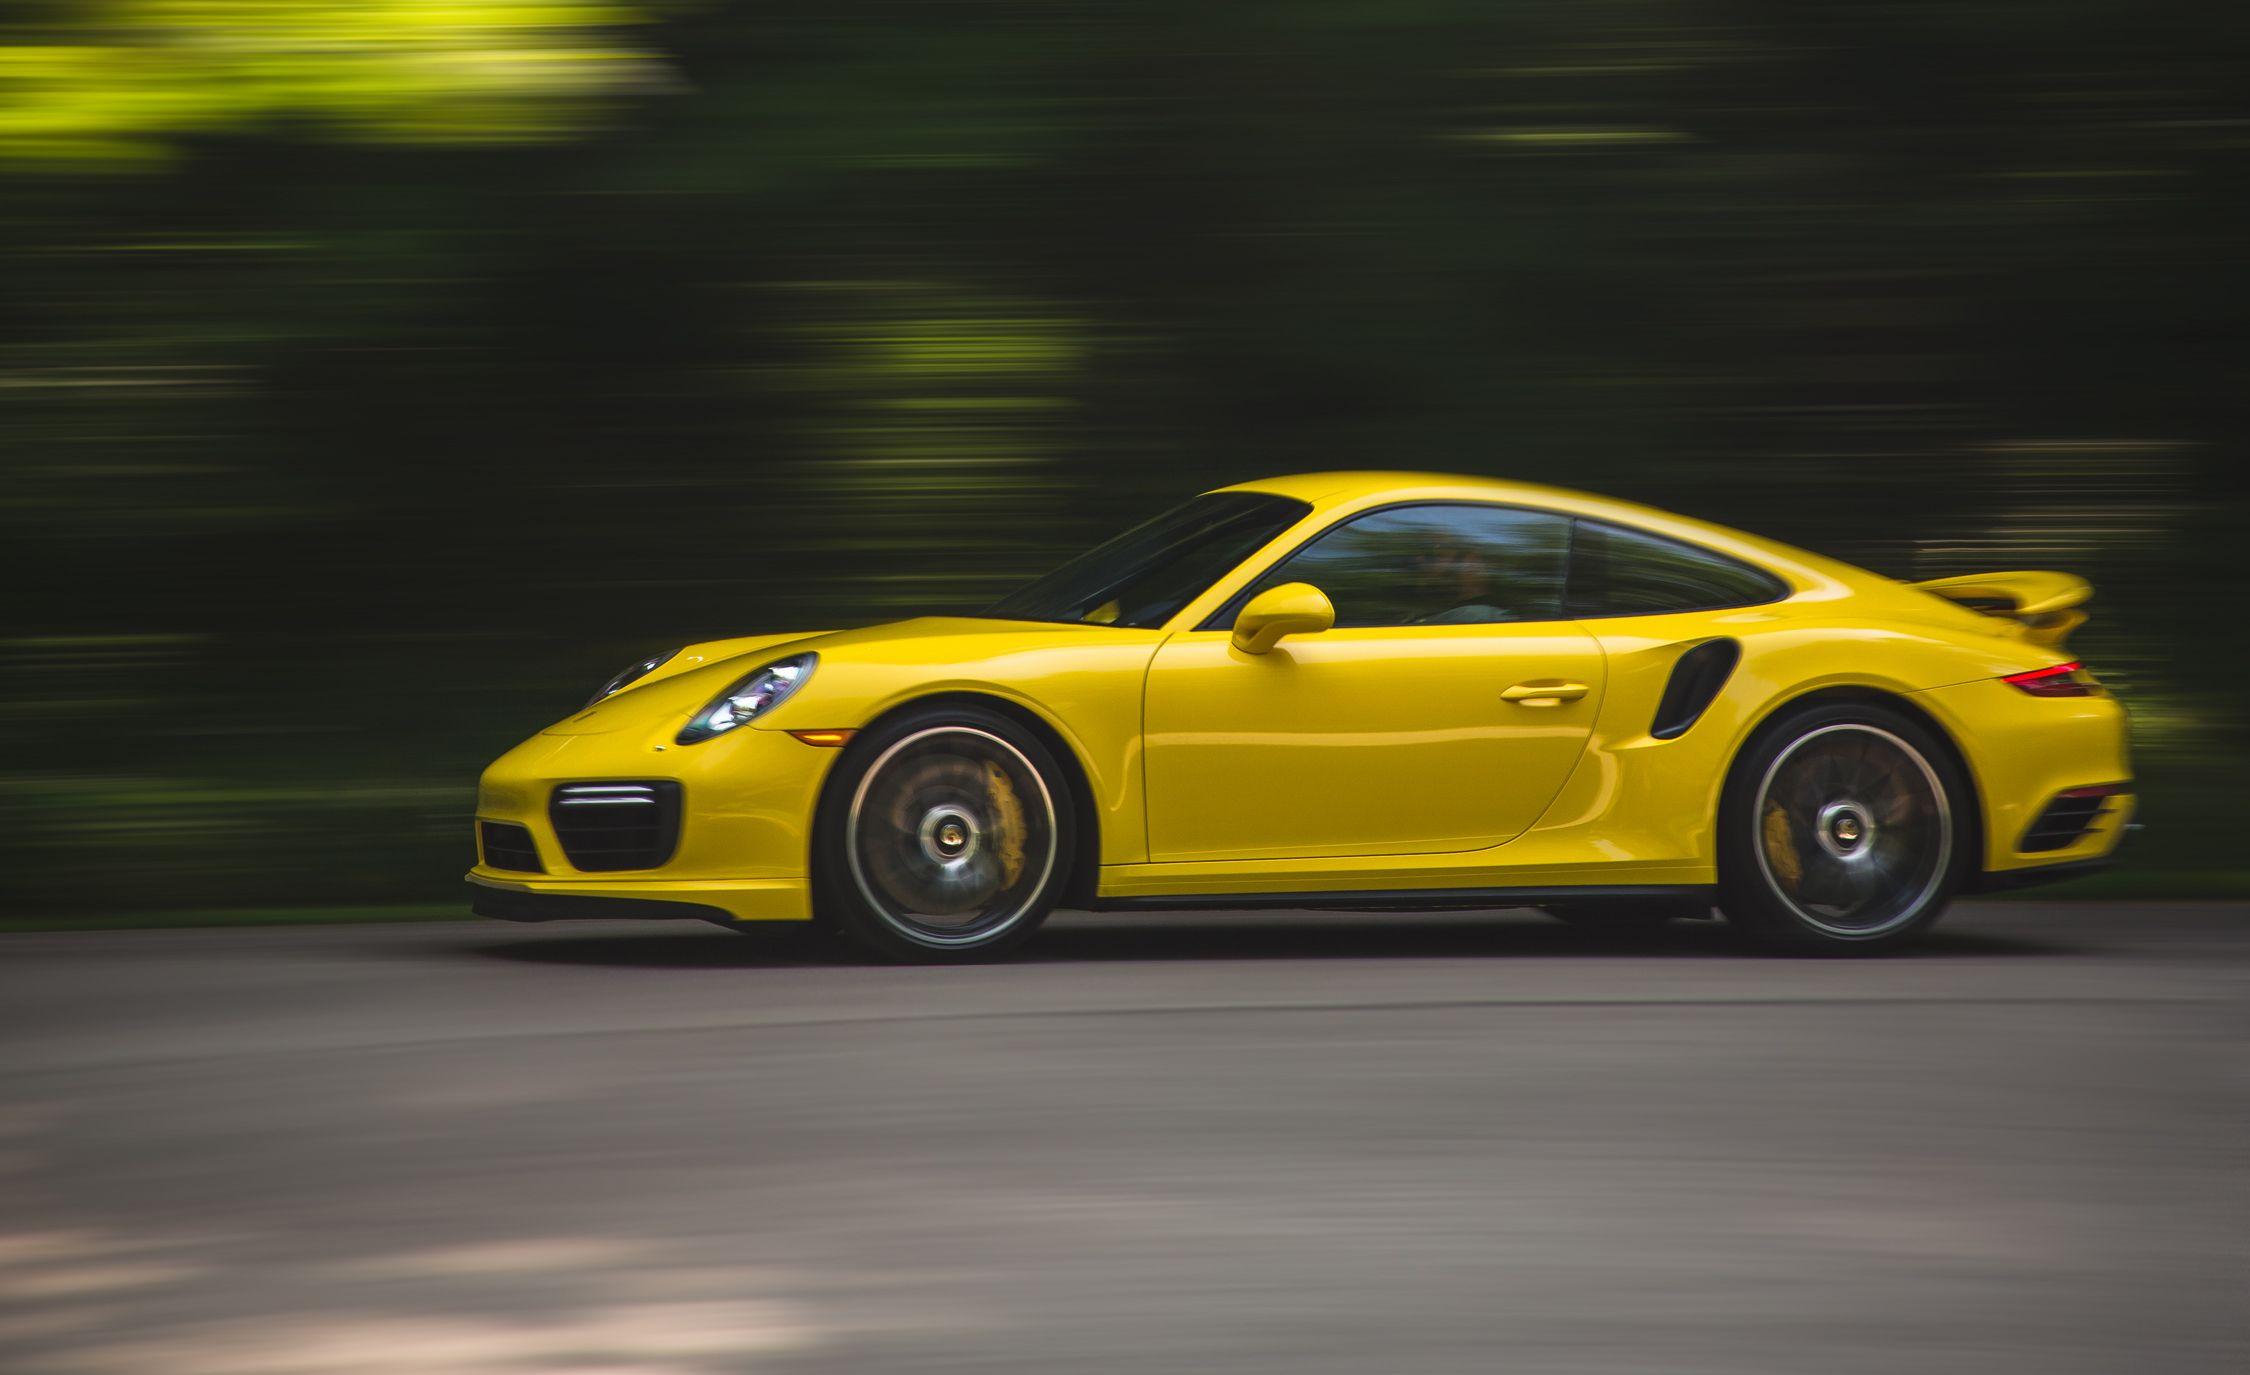 2019 porsche 911 turbo turbo s reviews porsche 911. Black Bedroom Furniture Sets. Home Design Ideas